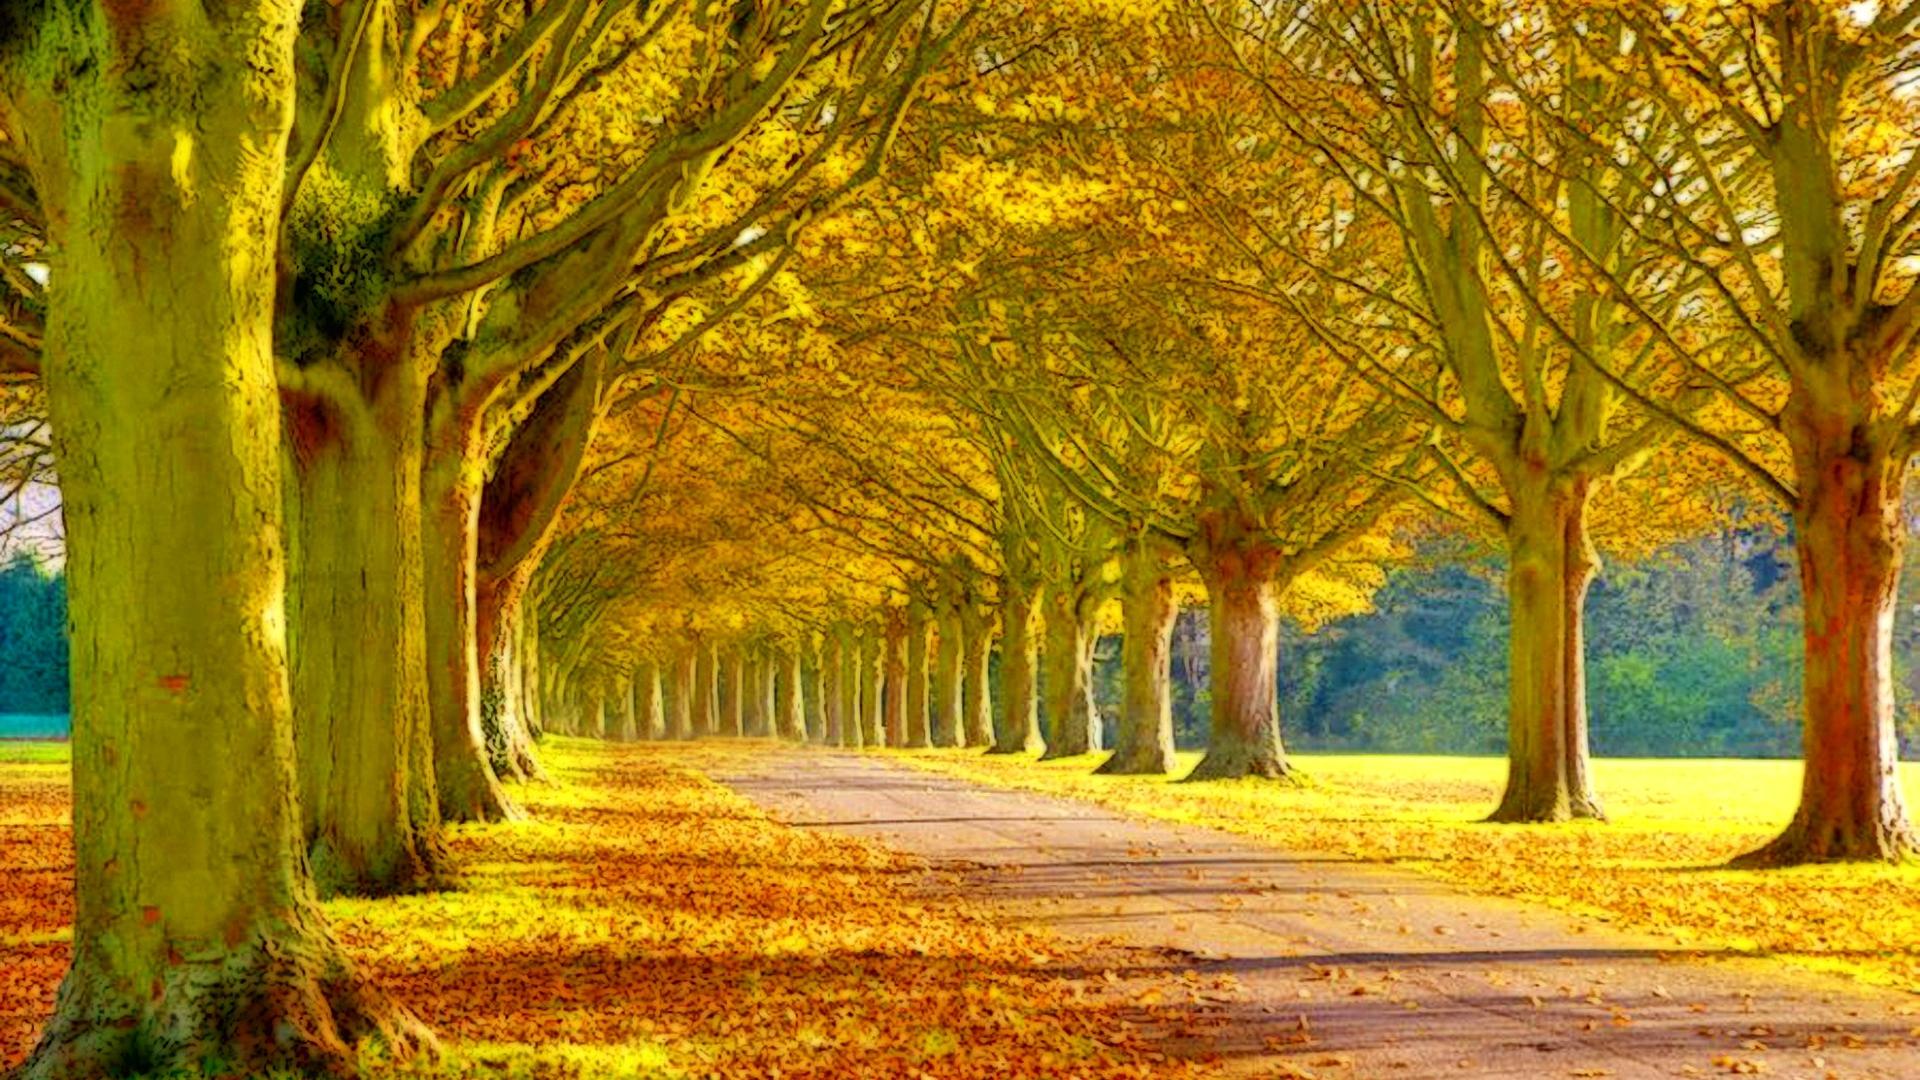 10 most beautiful free scenery images wallpaper free wallpaper world